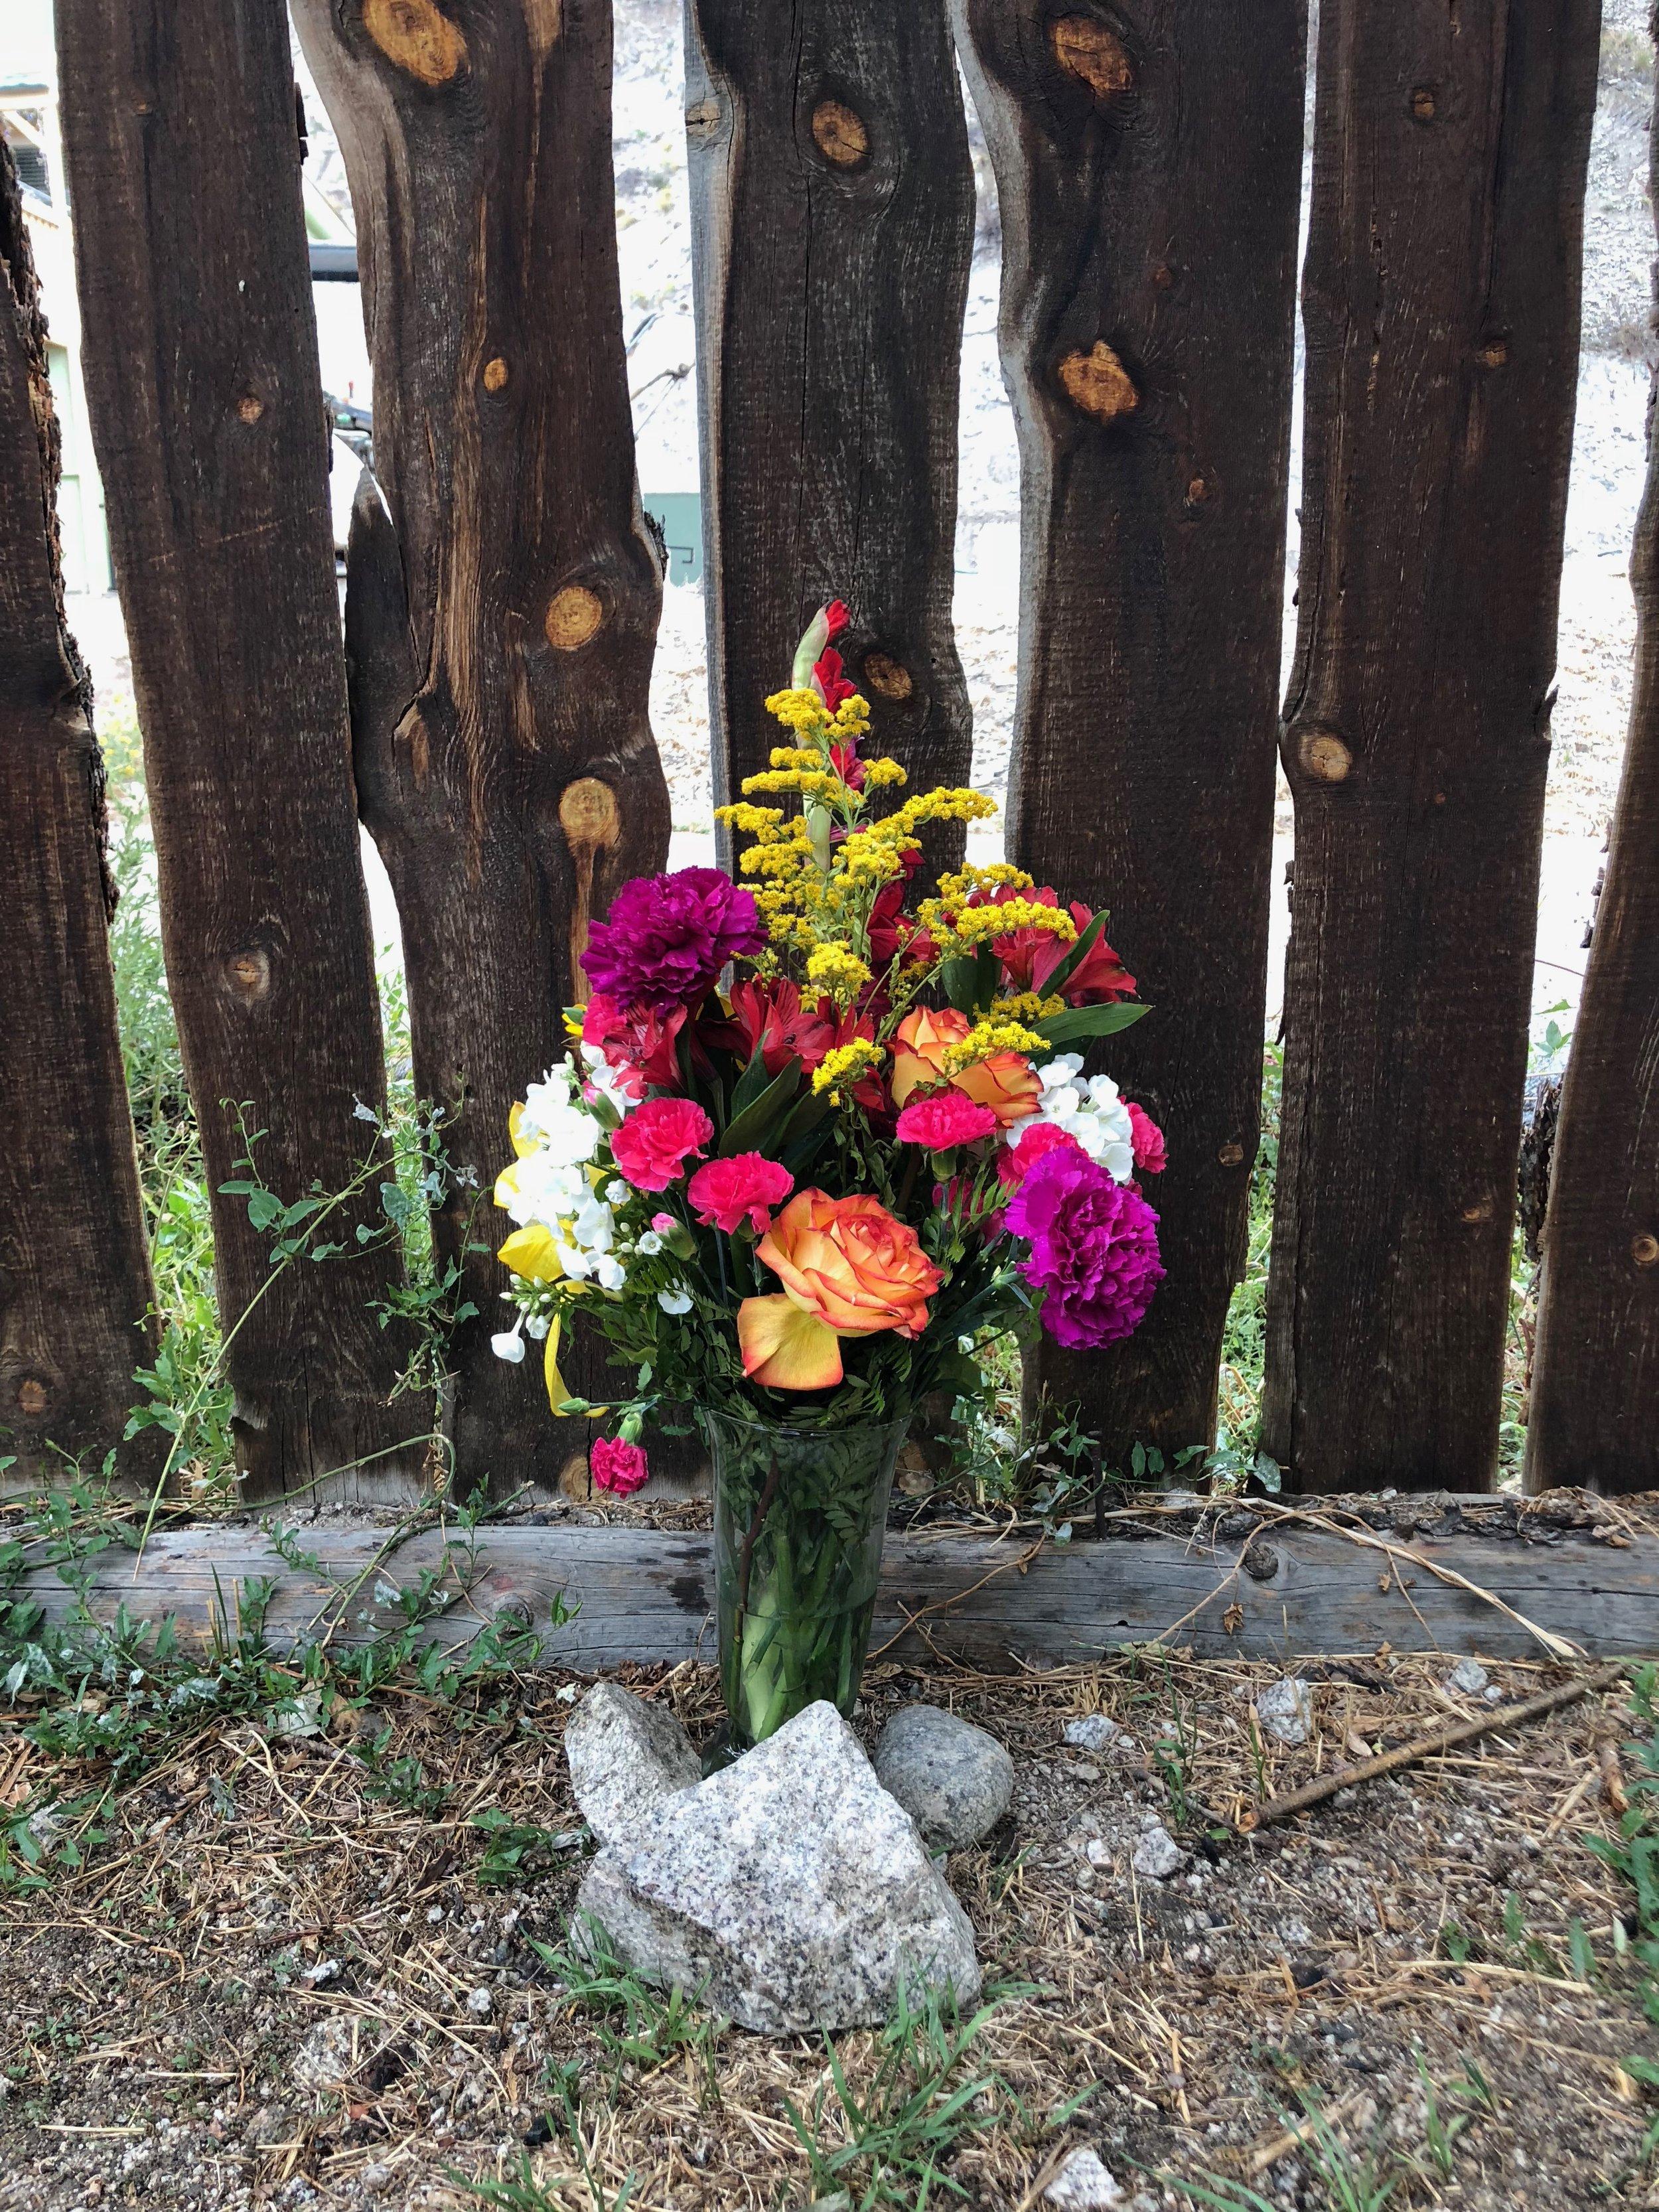 camp flowers at cottonwood hot springs - rebecca mir grady